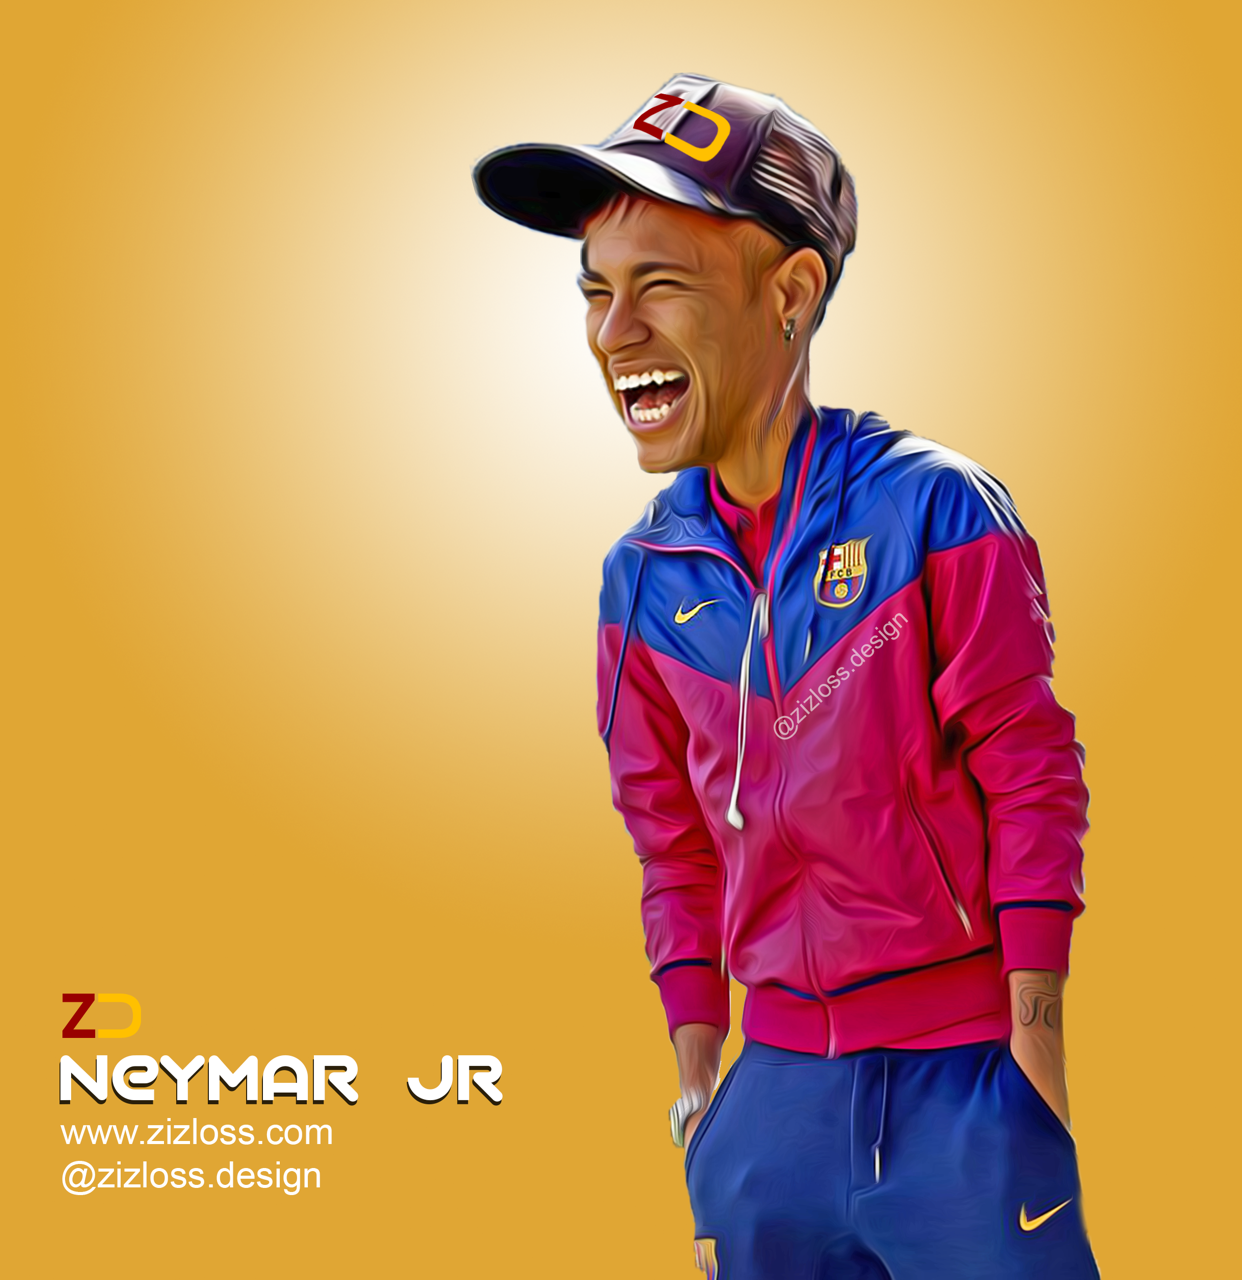 Neymar Jr نيمار Caricature Cartoon Digital Art Caricature